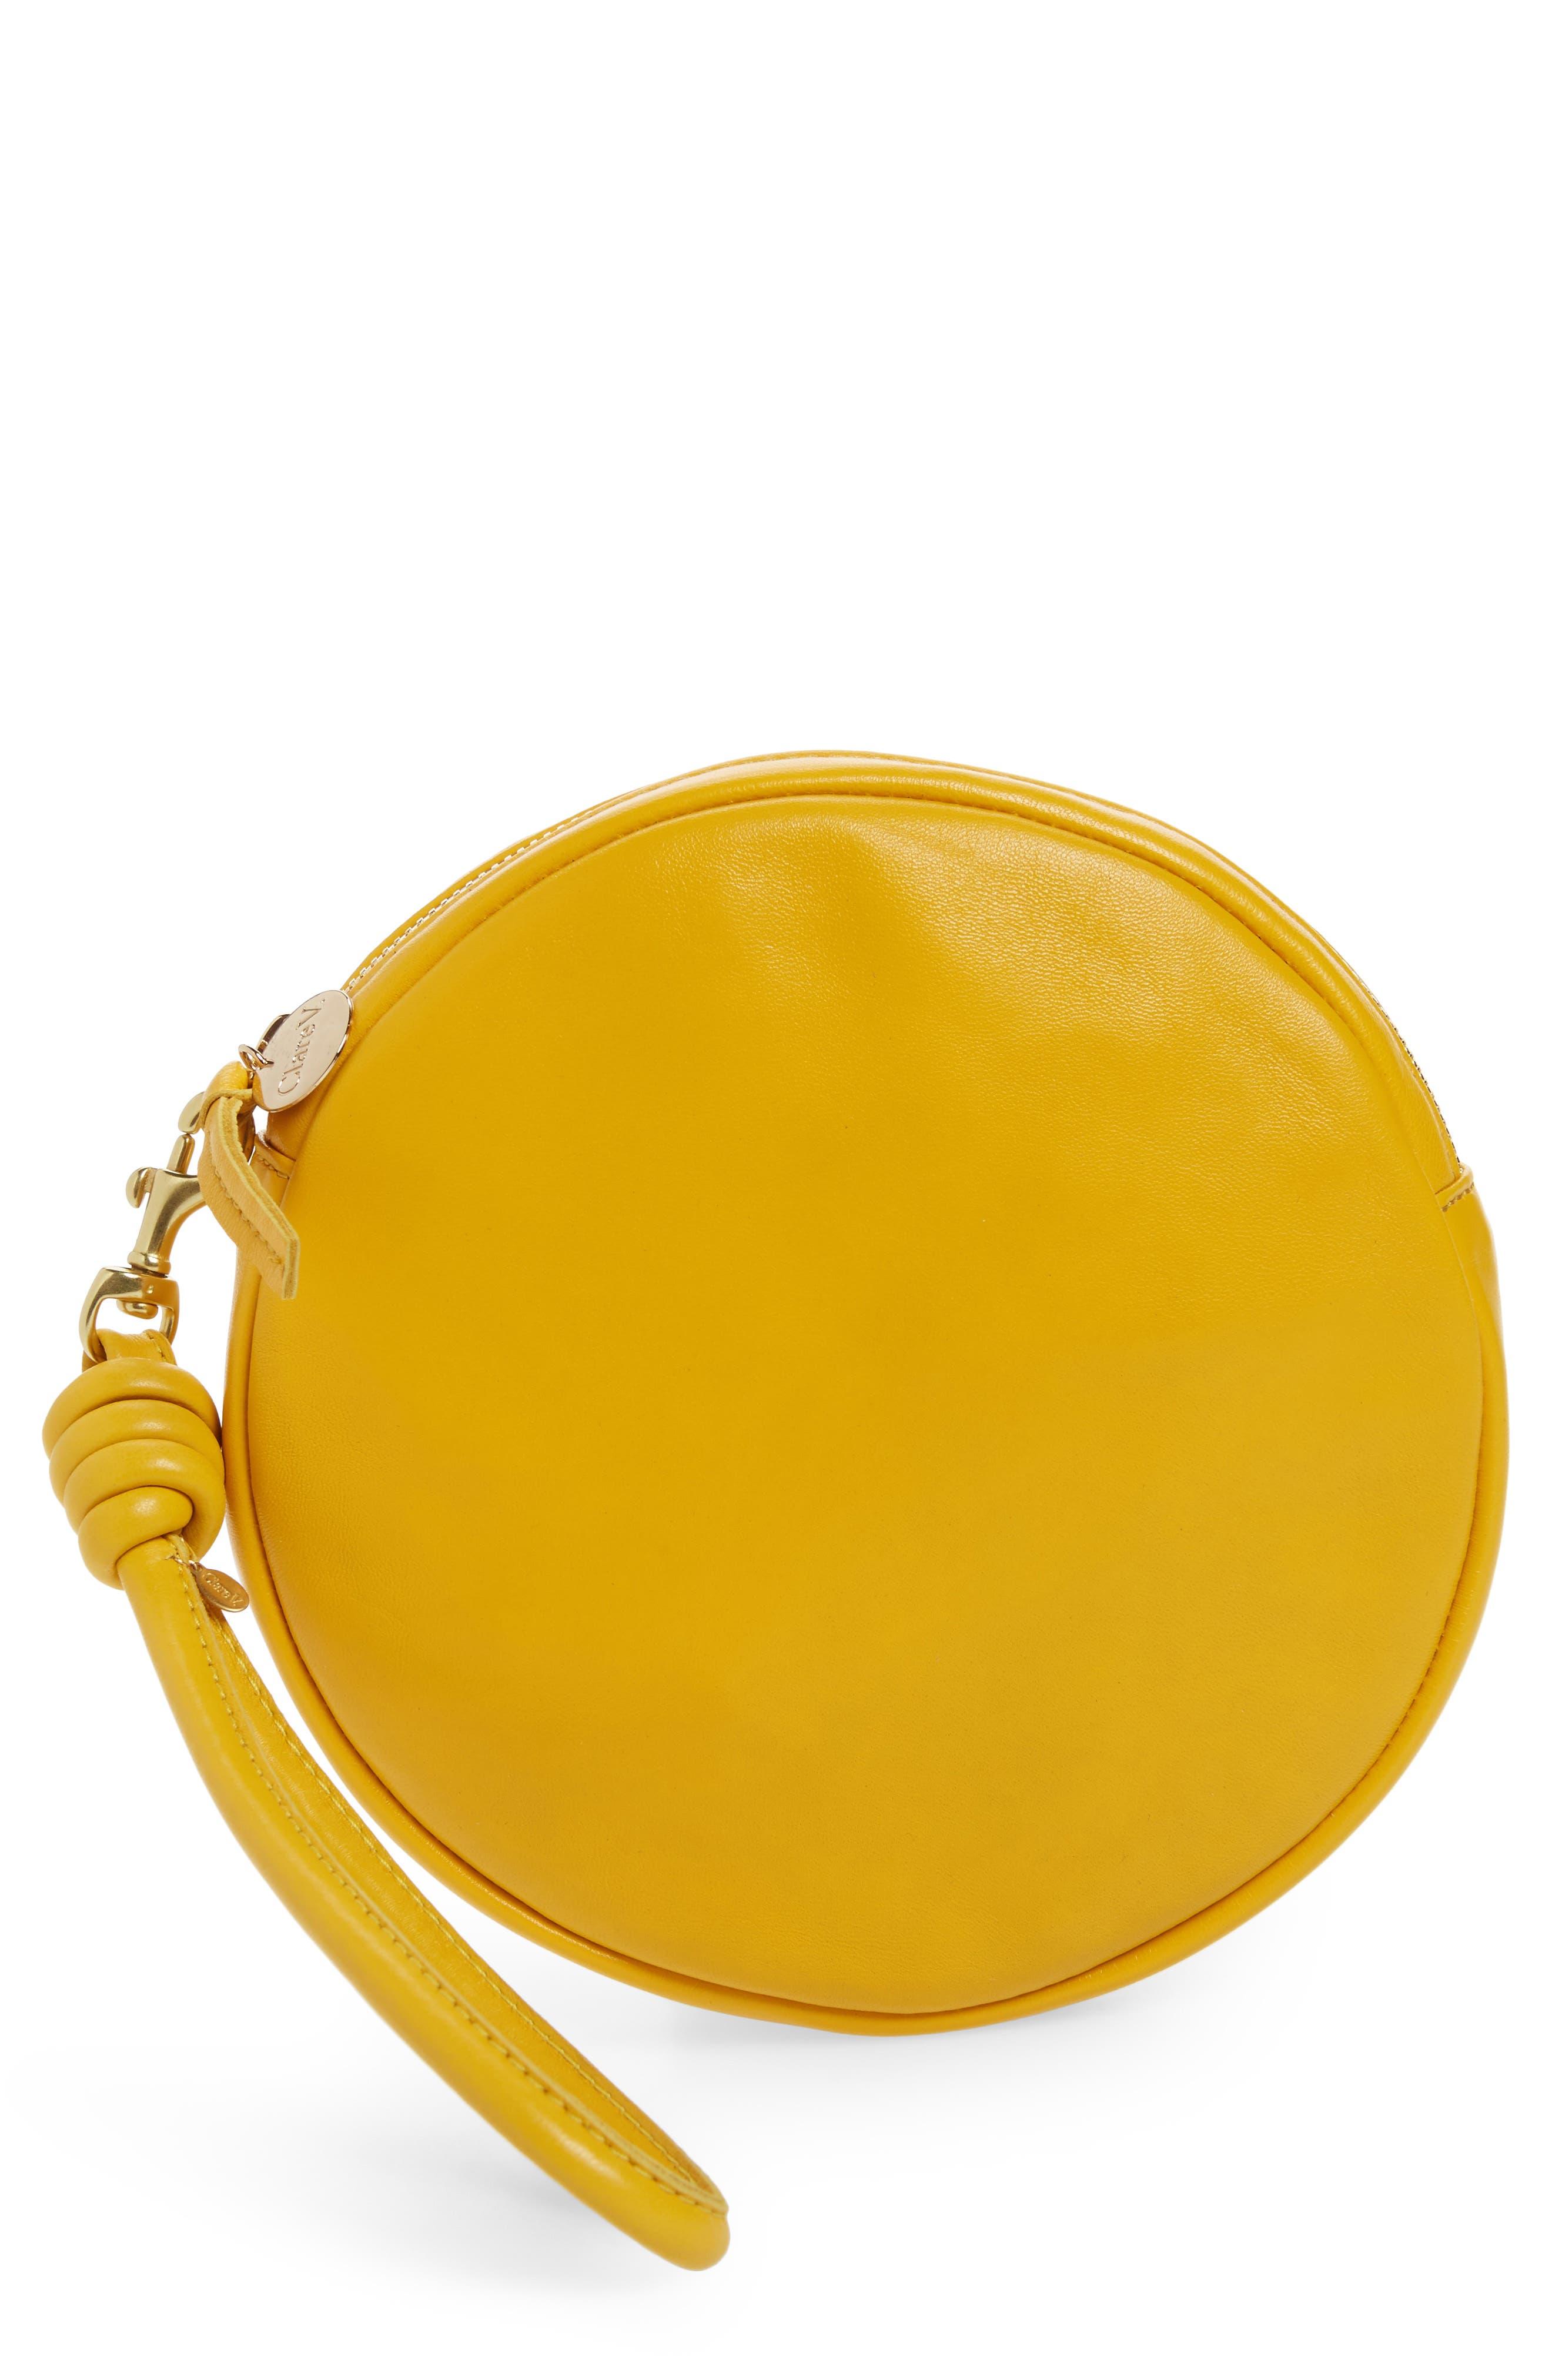 Lambskin Leather Circle Clutch,                             Main thumbnail 1, color,                             Yellow Golfa